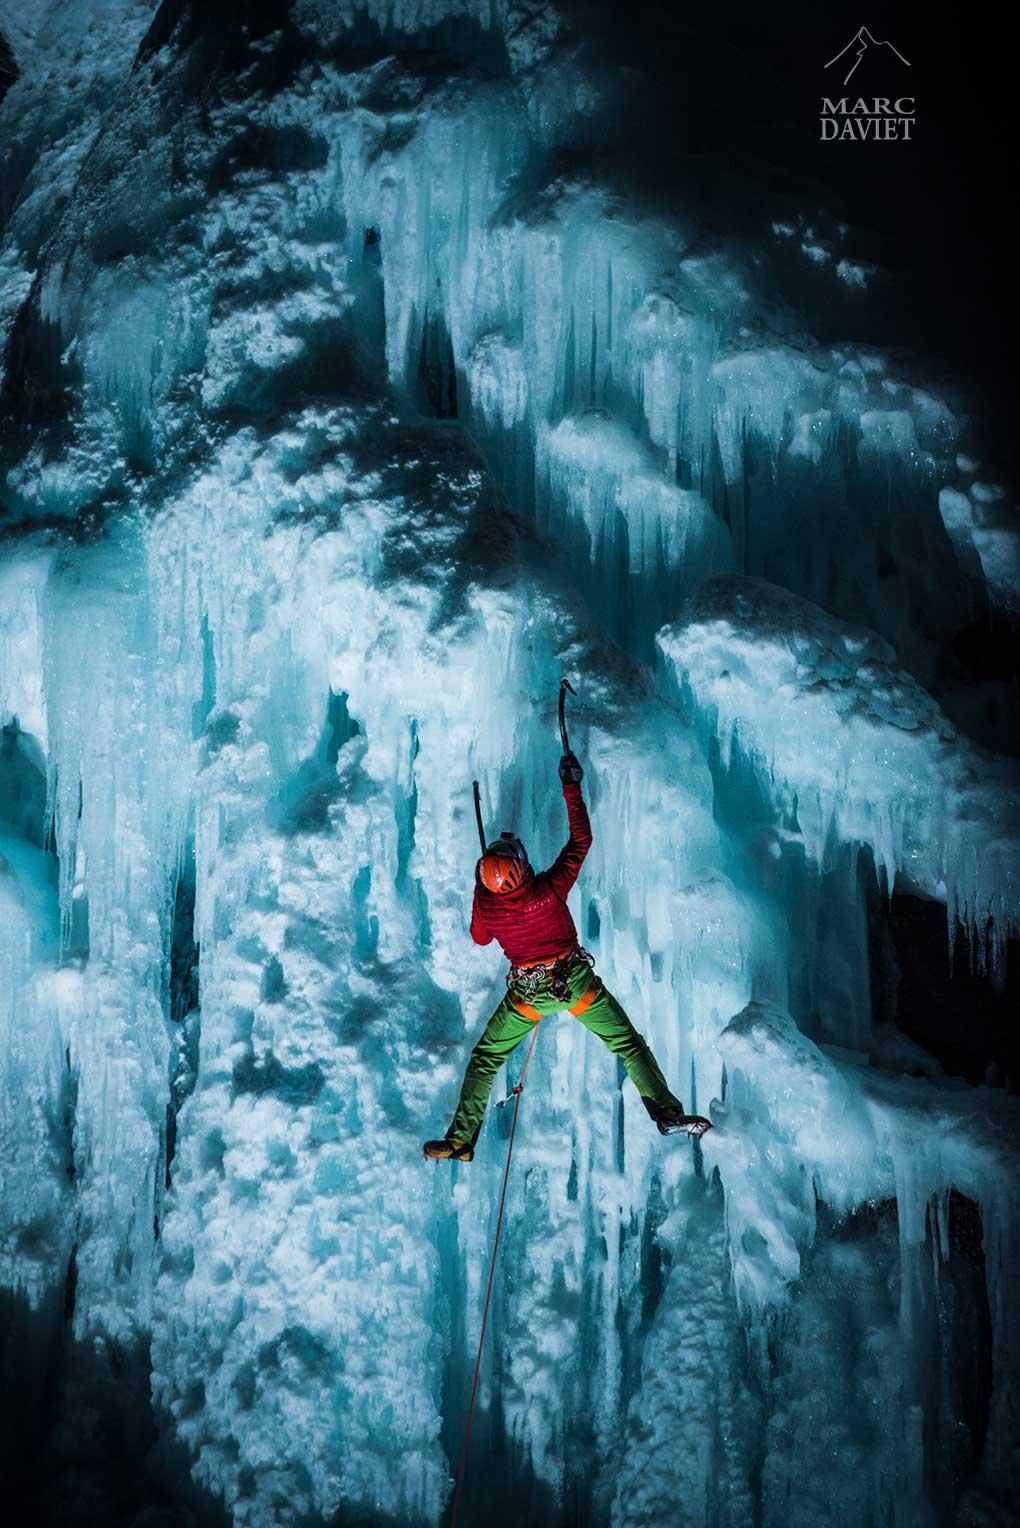 Cascade de glace de nuit